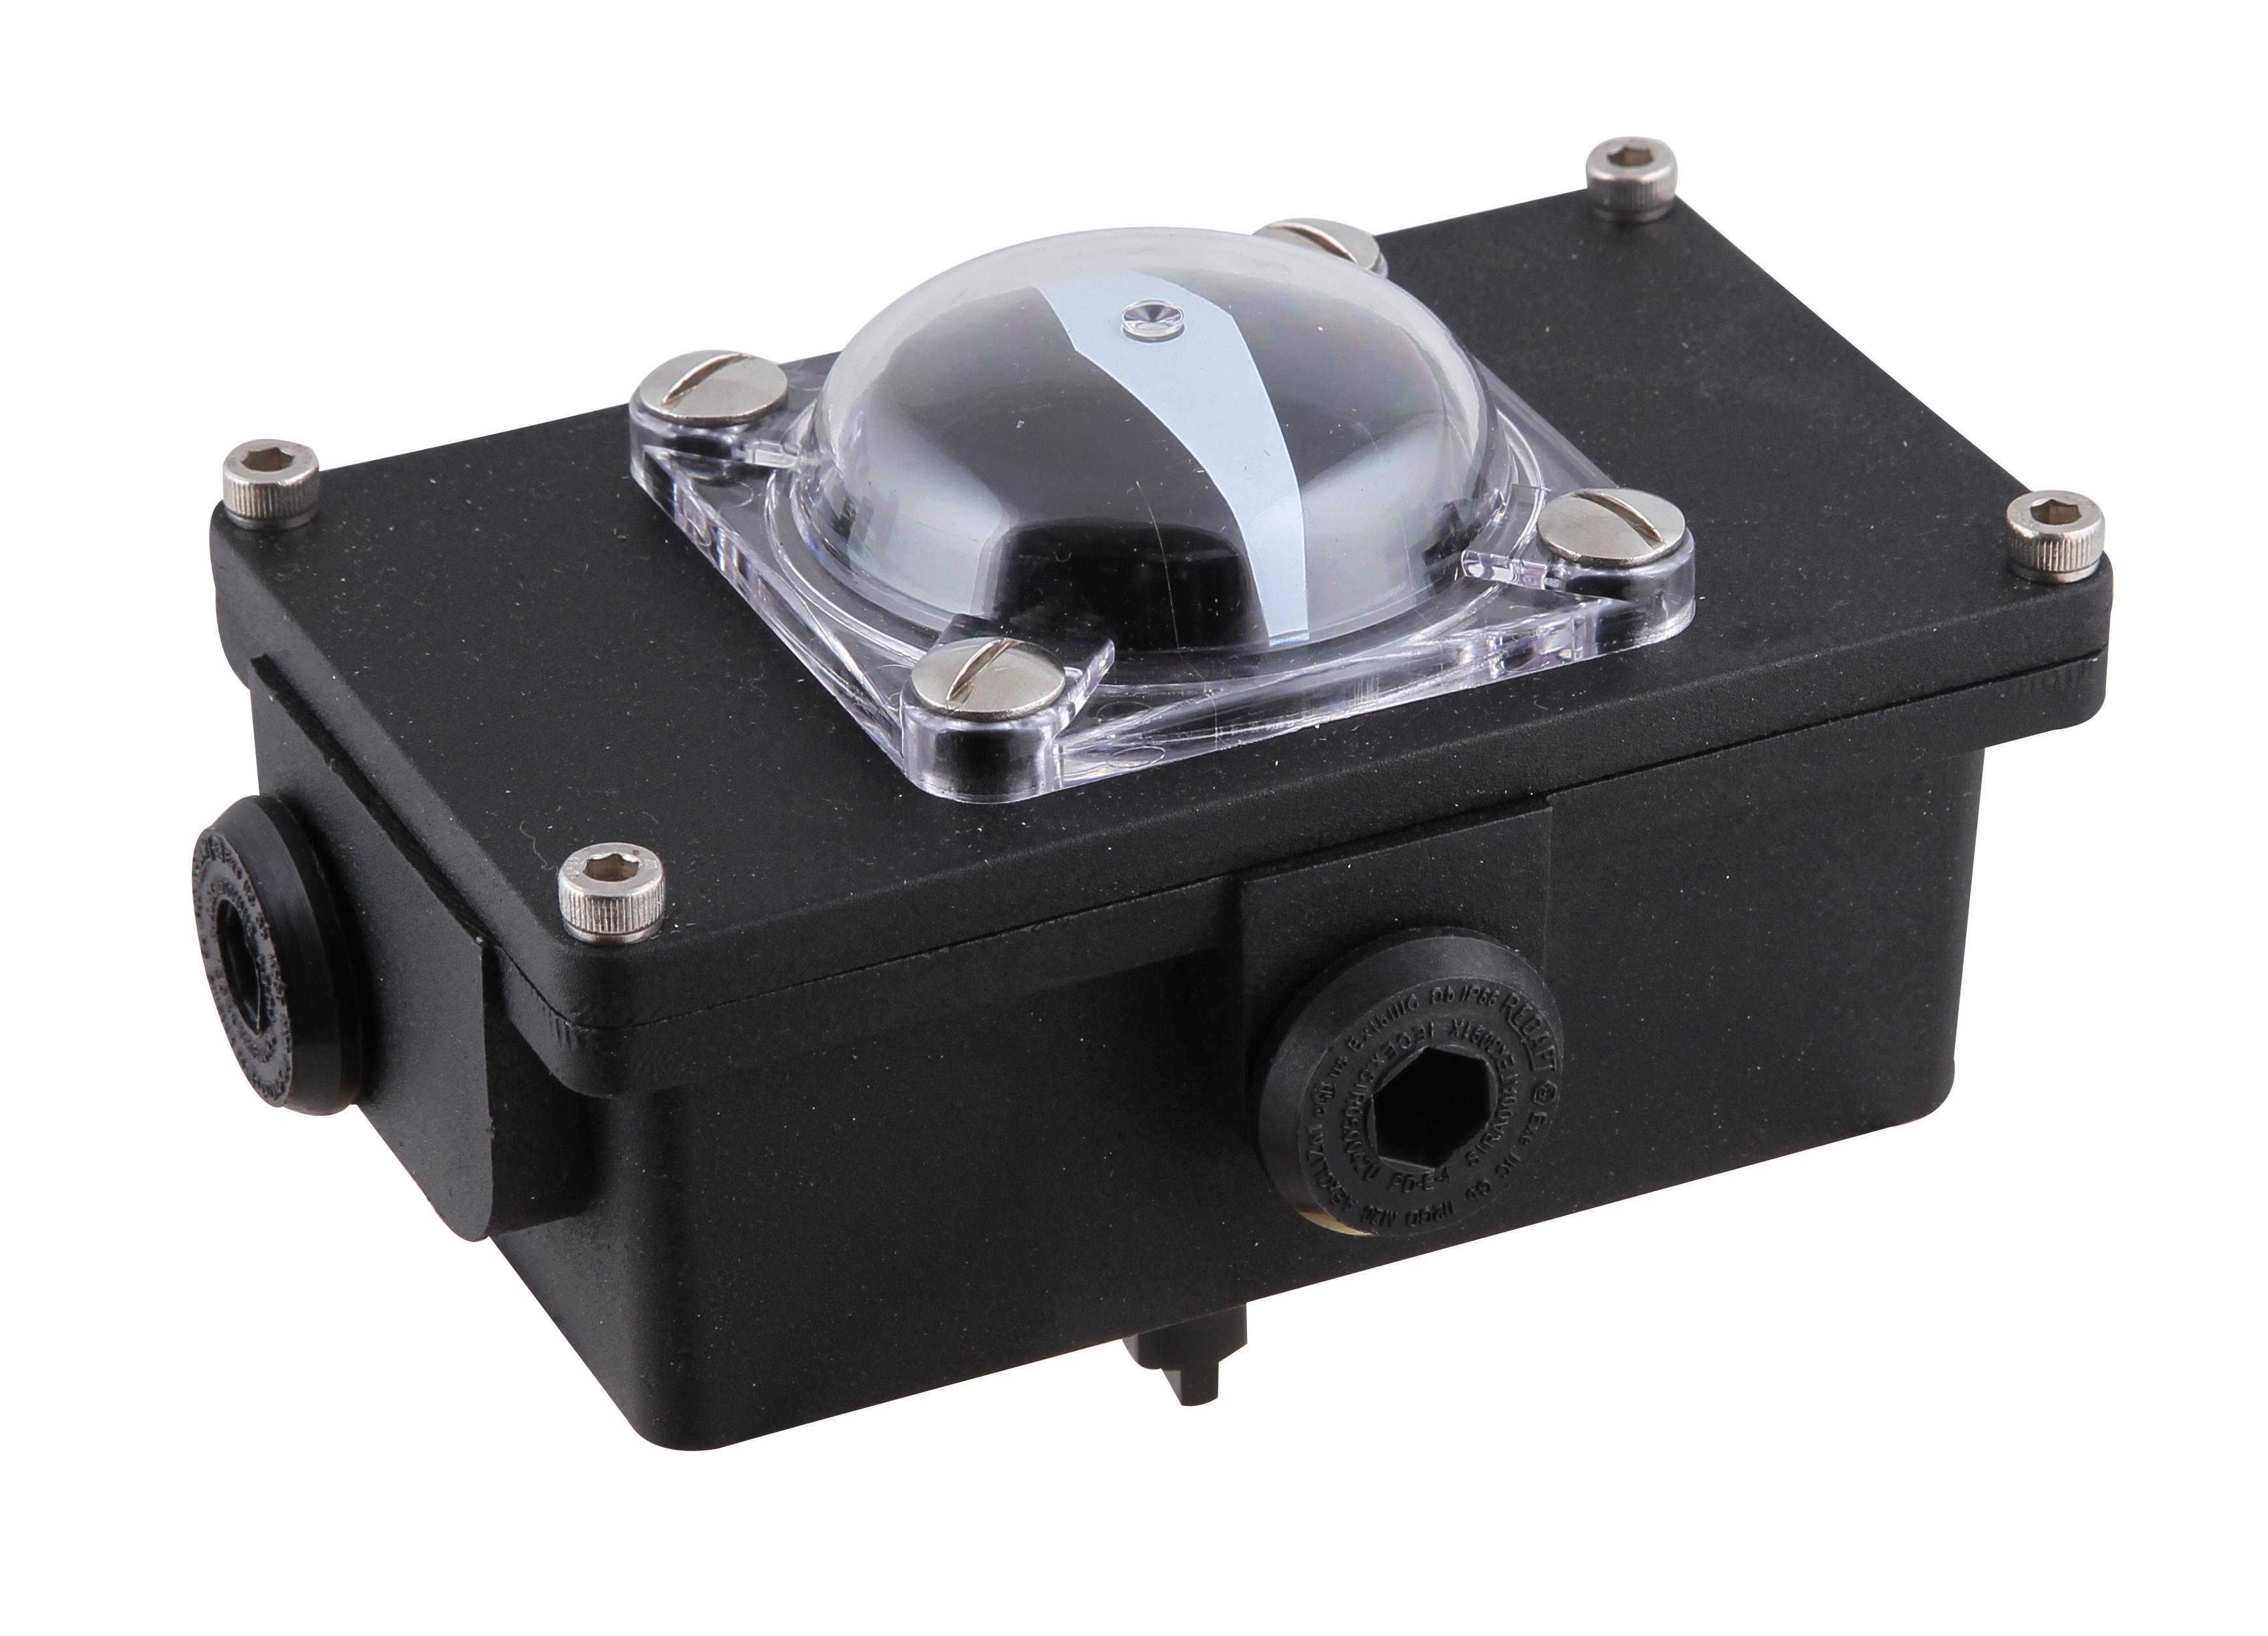 LP-0B201BN00-00-0R1 Avid Keystone 792 LP